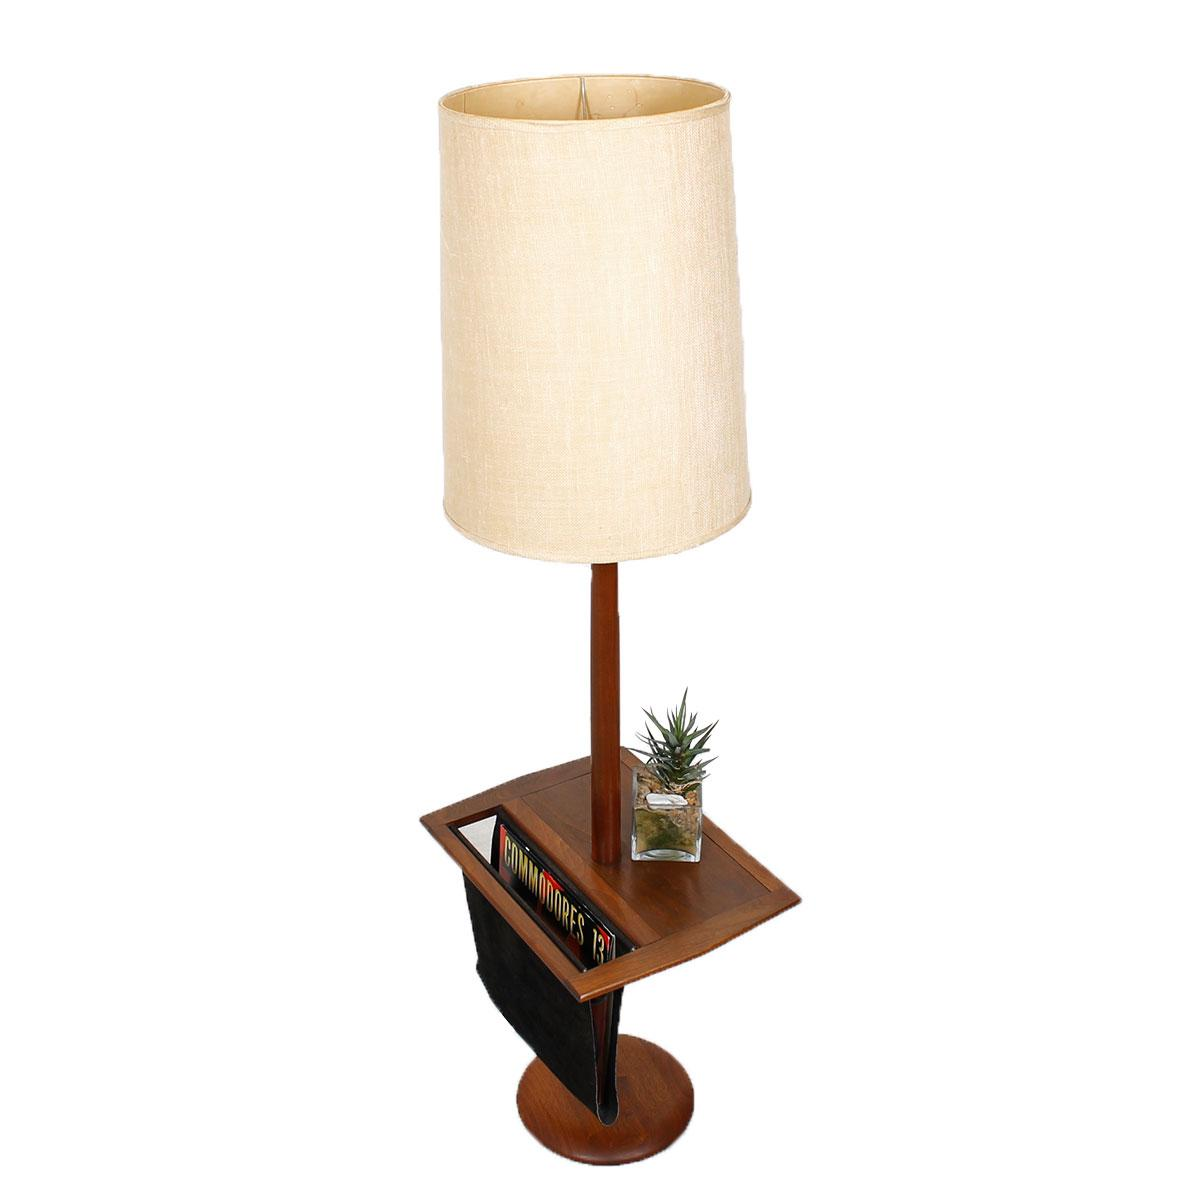 Laurel Floor Lamp with Table & Magazine Holder